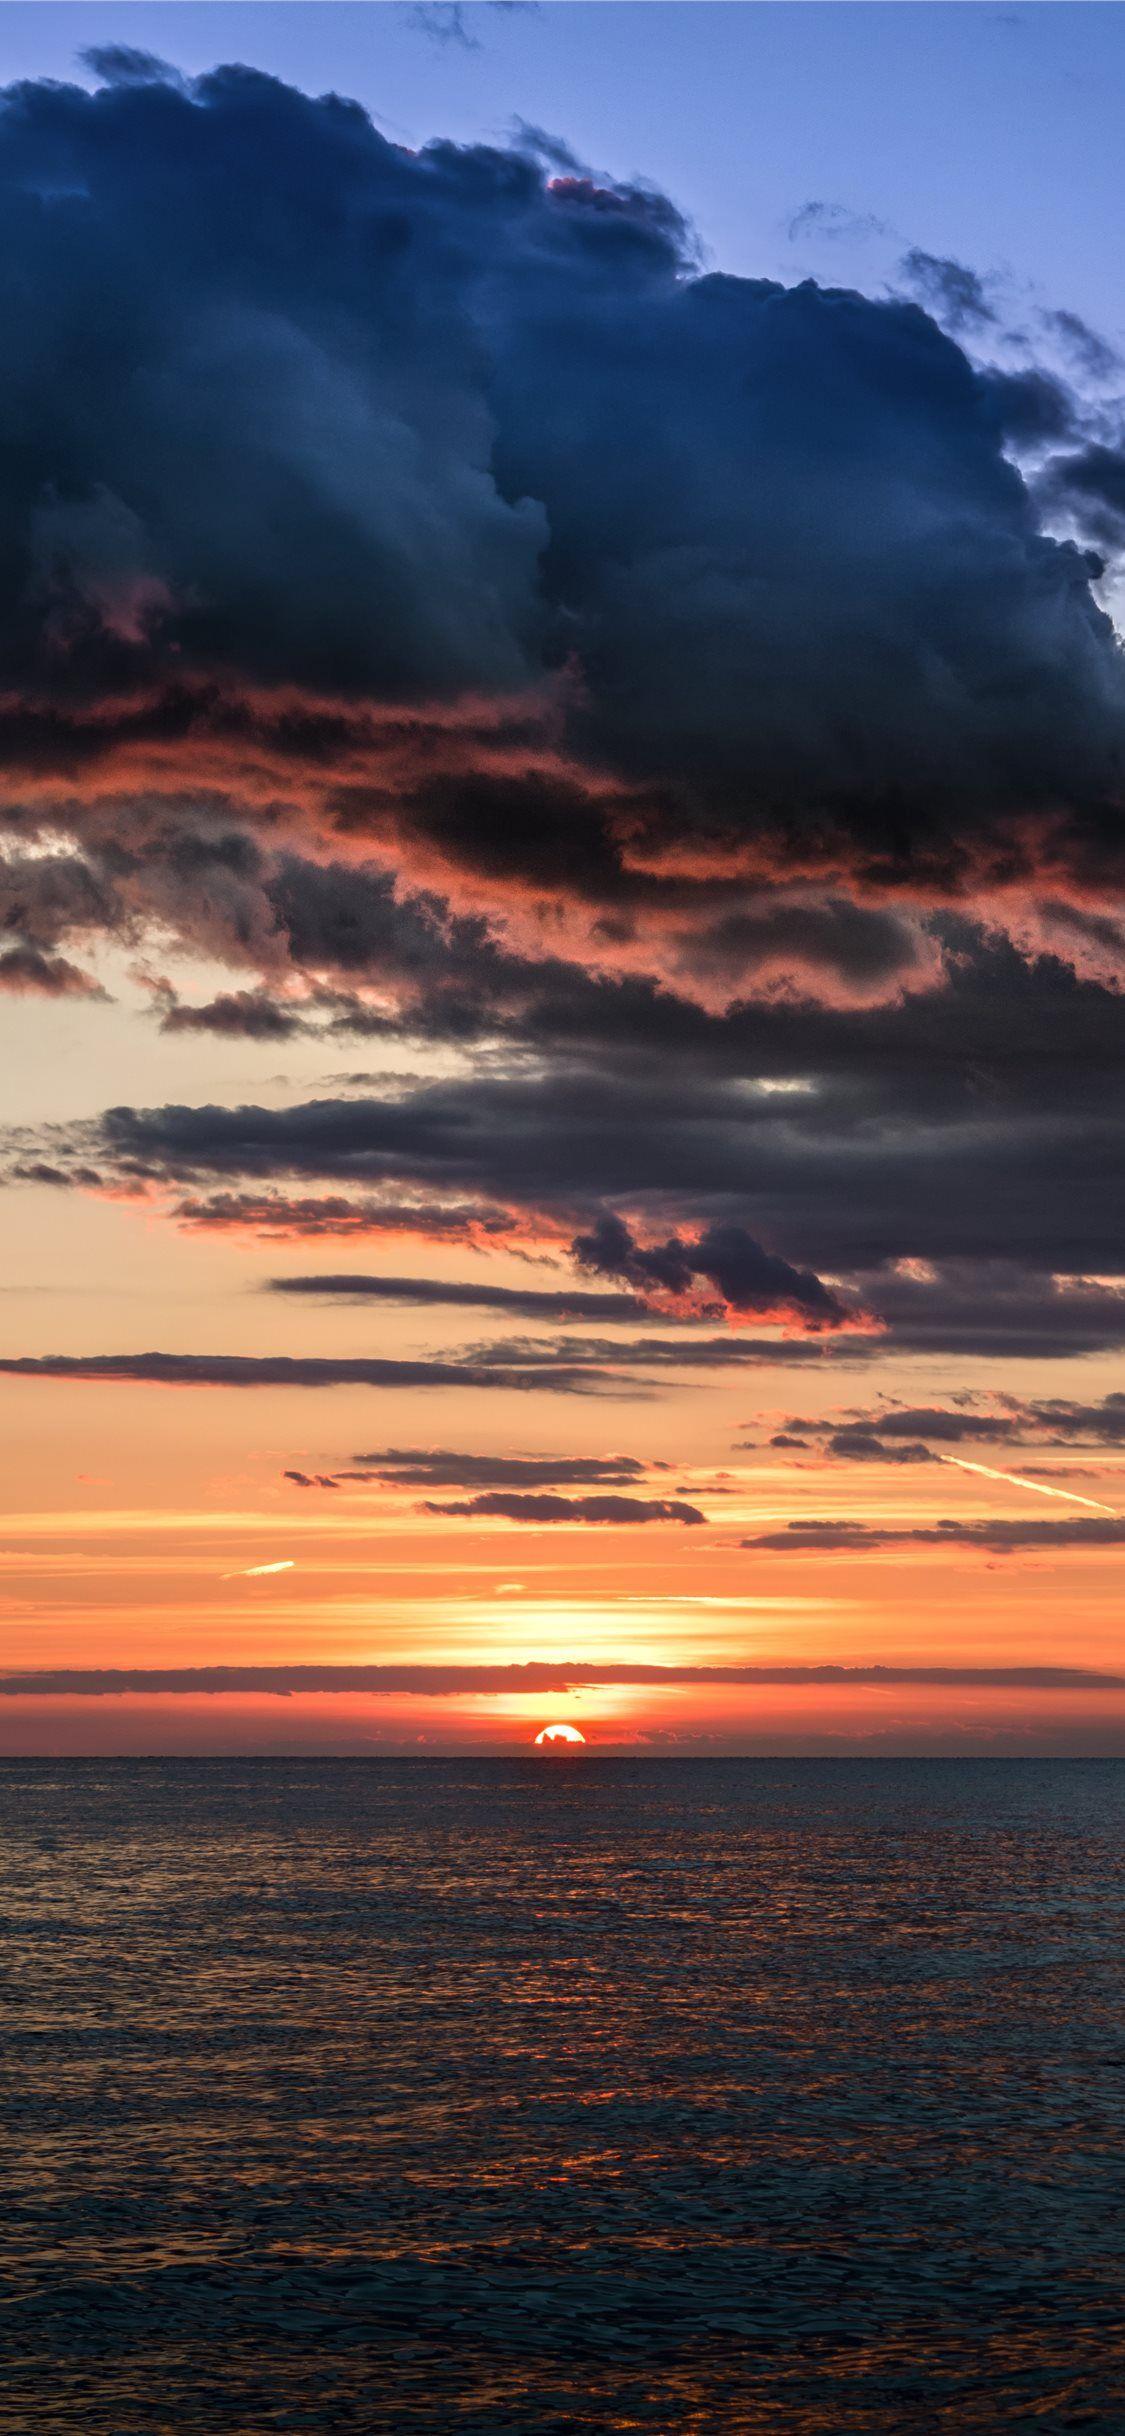 Tropical Sunset Croatia Reflection Cloud Sunsetsky Croatia Wallpaper Background Iphonex Iphonexs Sunset Iphone Wallpaper Sunset Wallpaper Background